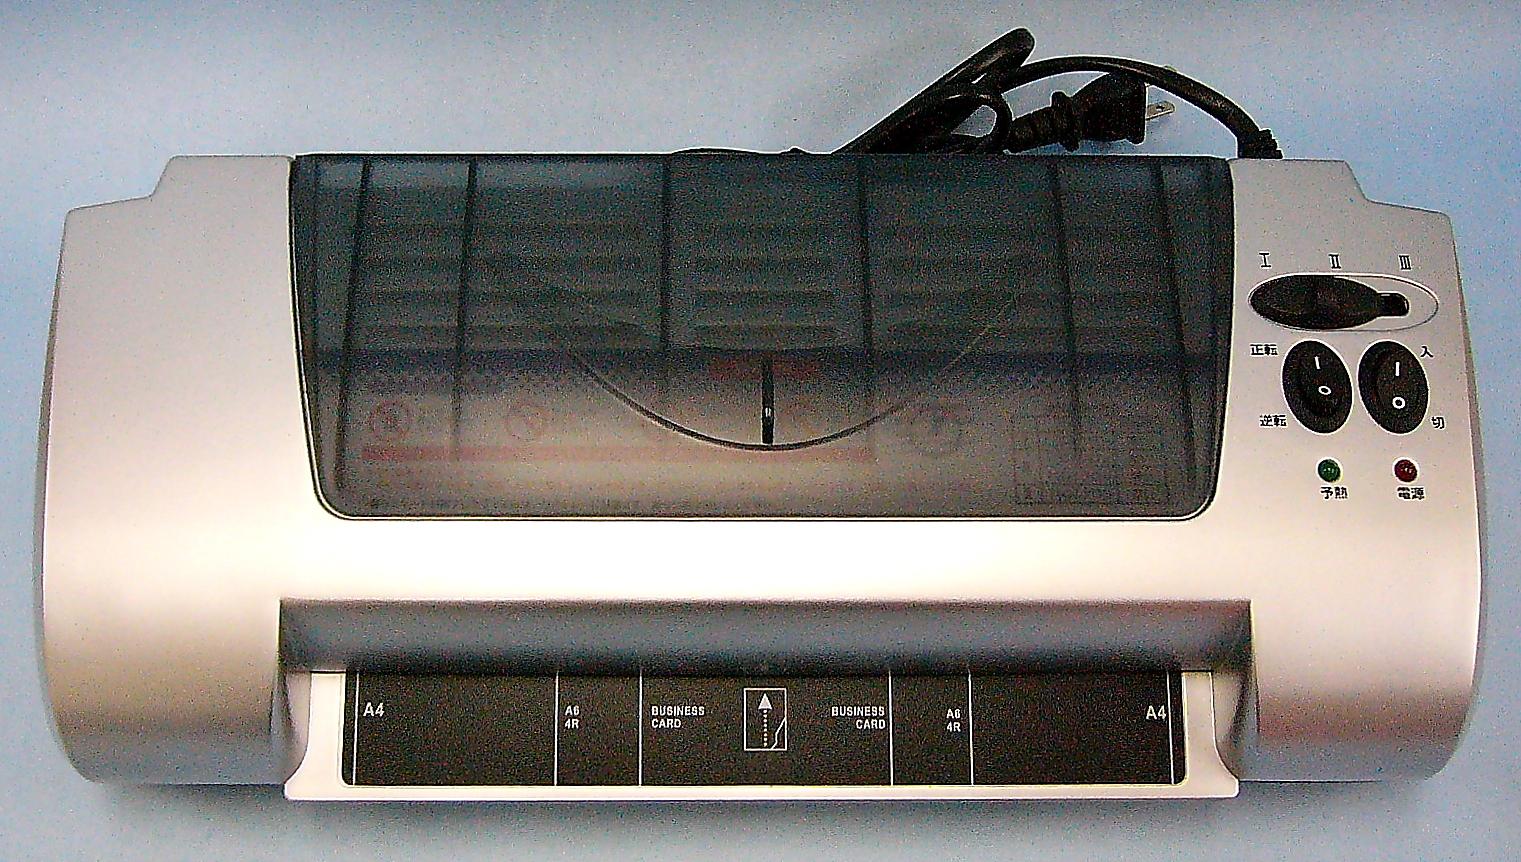 オーム電機 ラミネーター LAM-802N